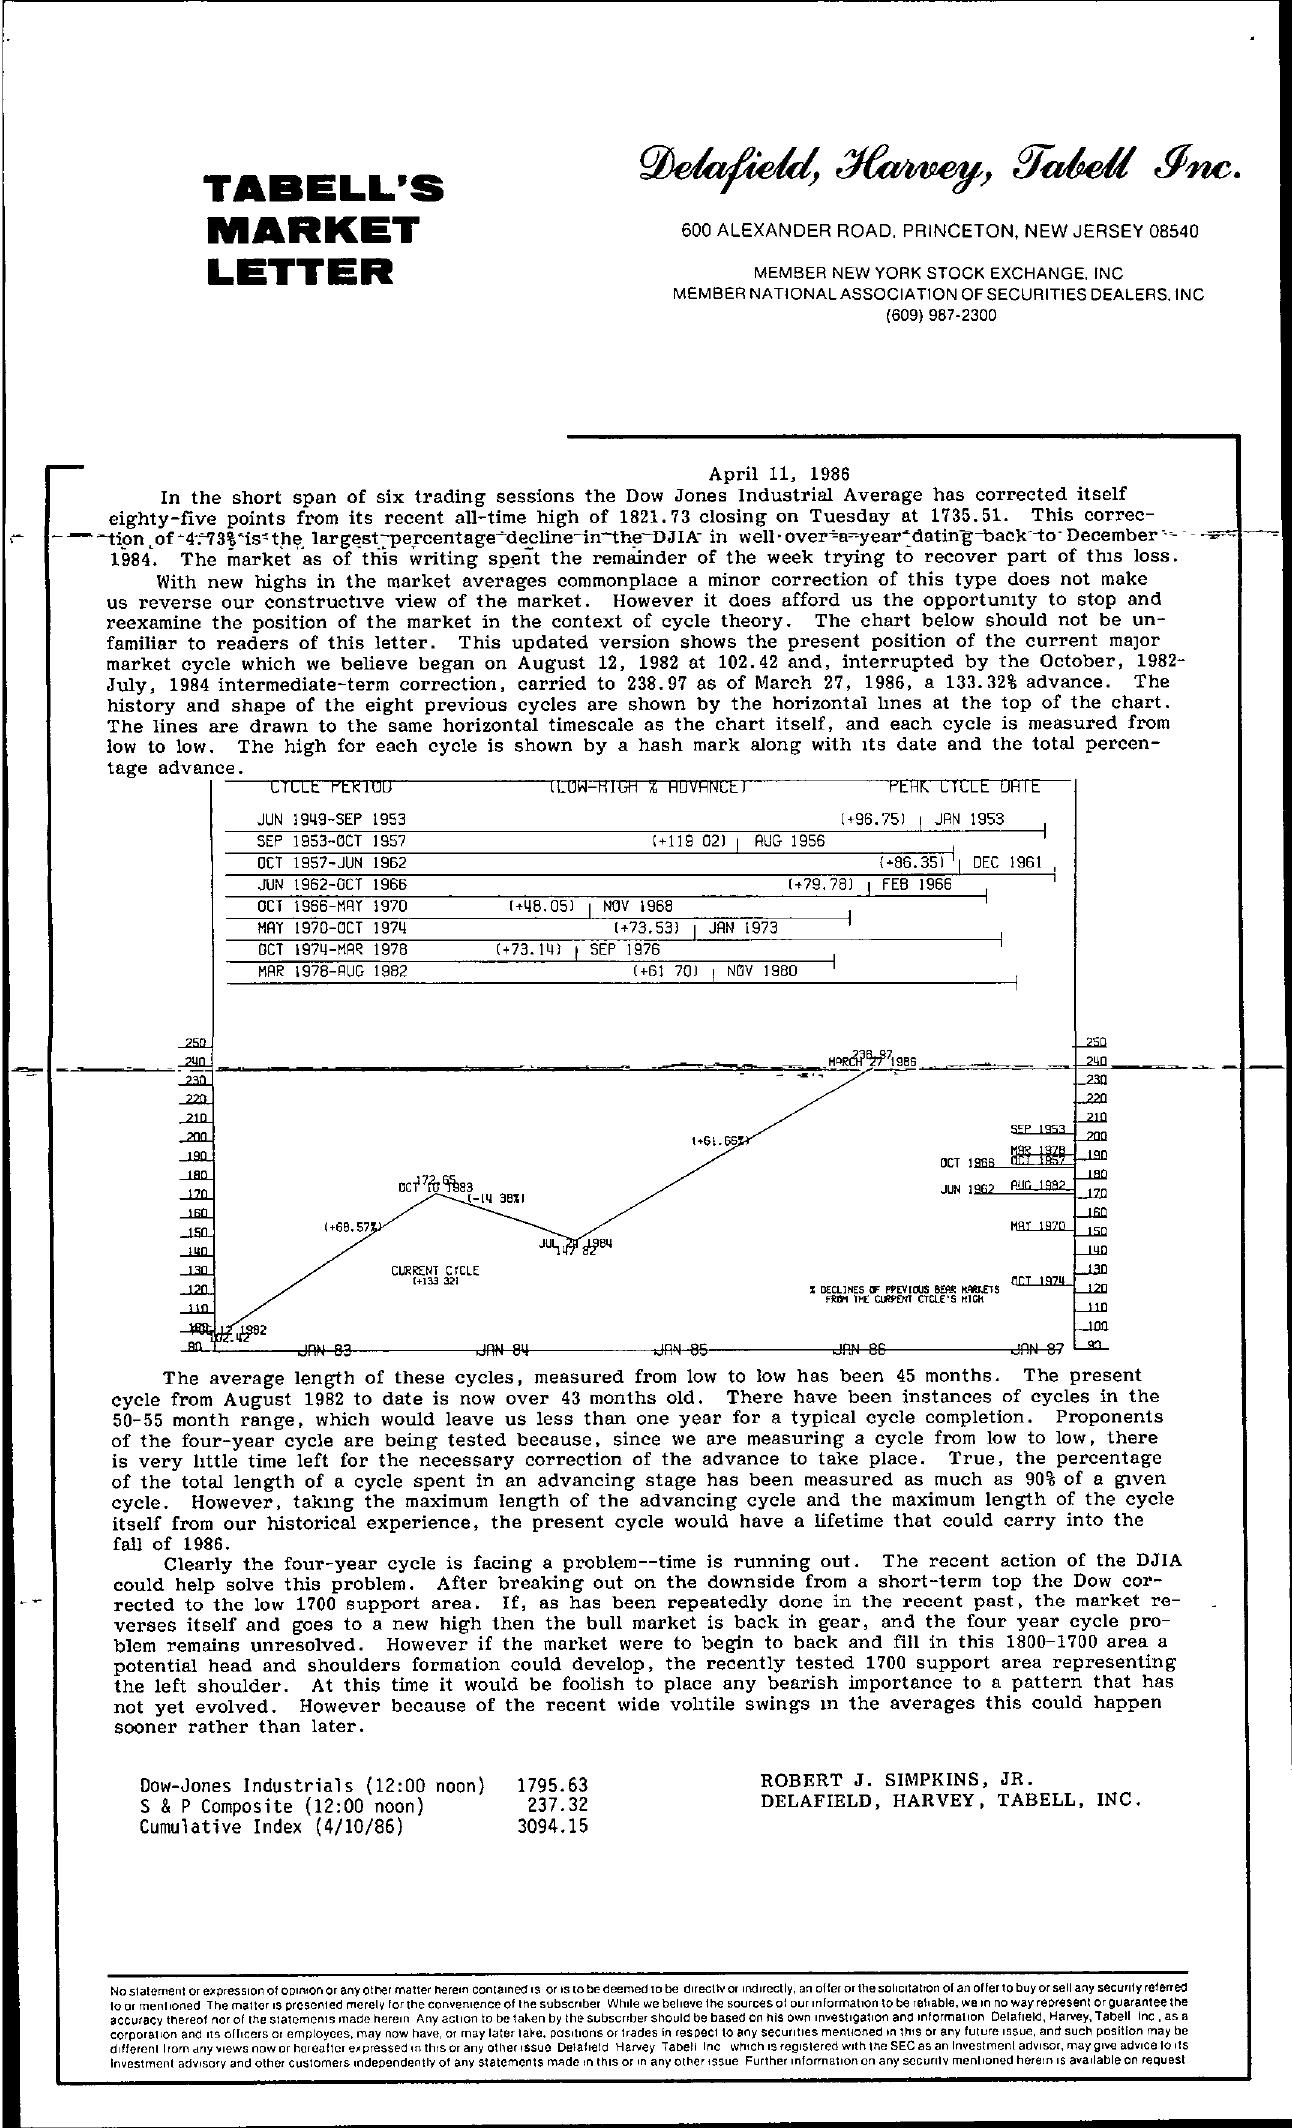 Tabell's Market Letter - April 11, 1986